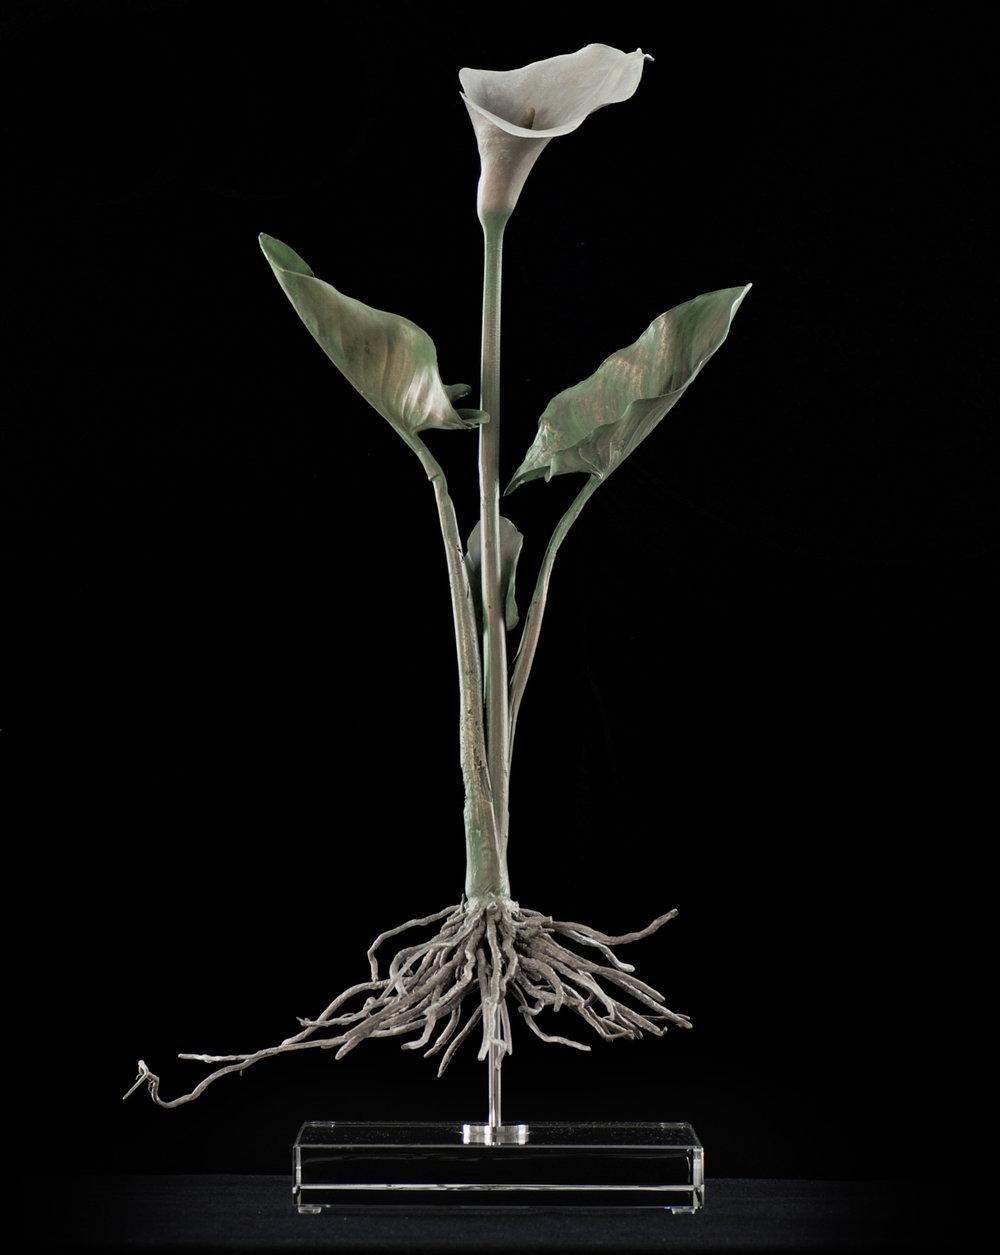 <i>Zantedeschia aethiopica (arum lily)  </i>